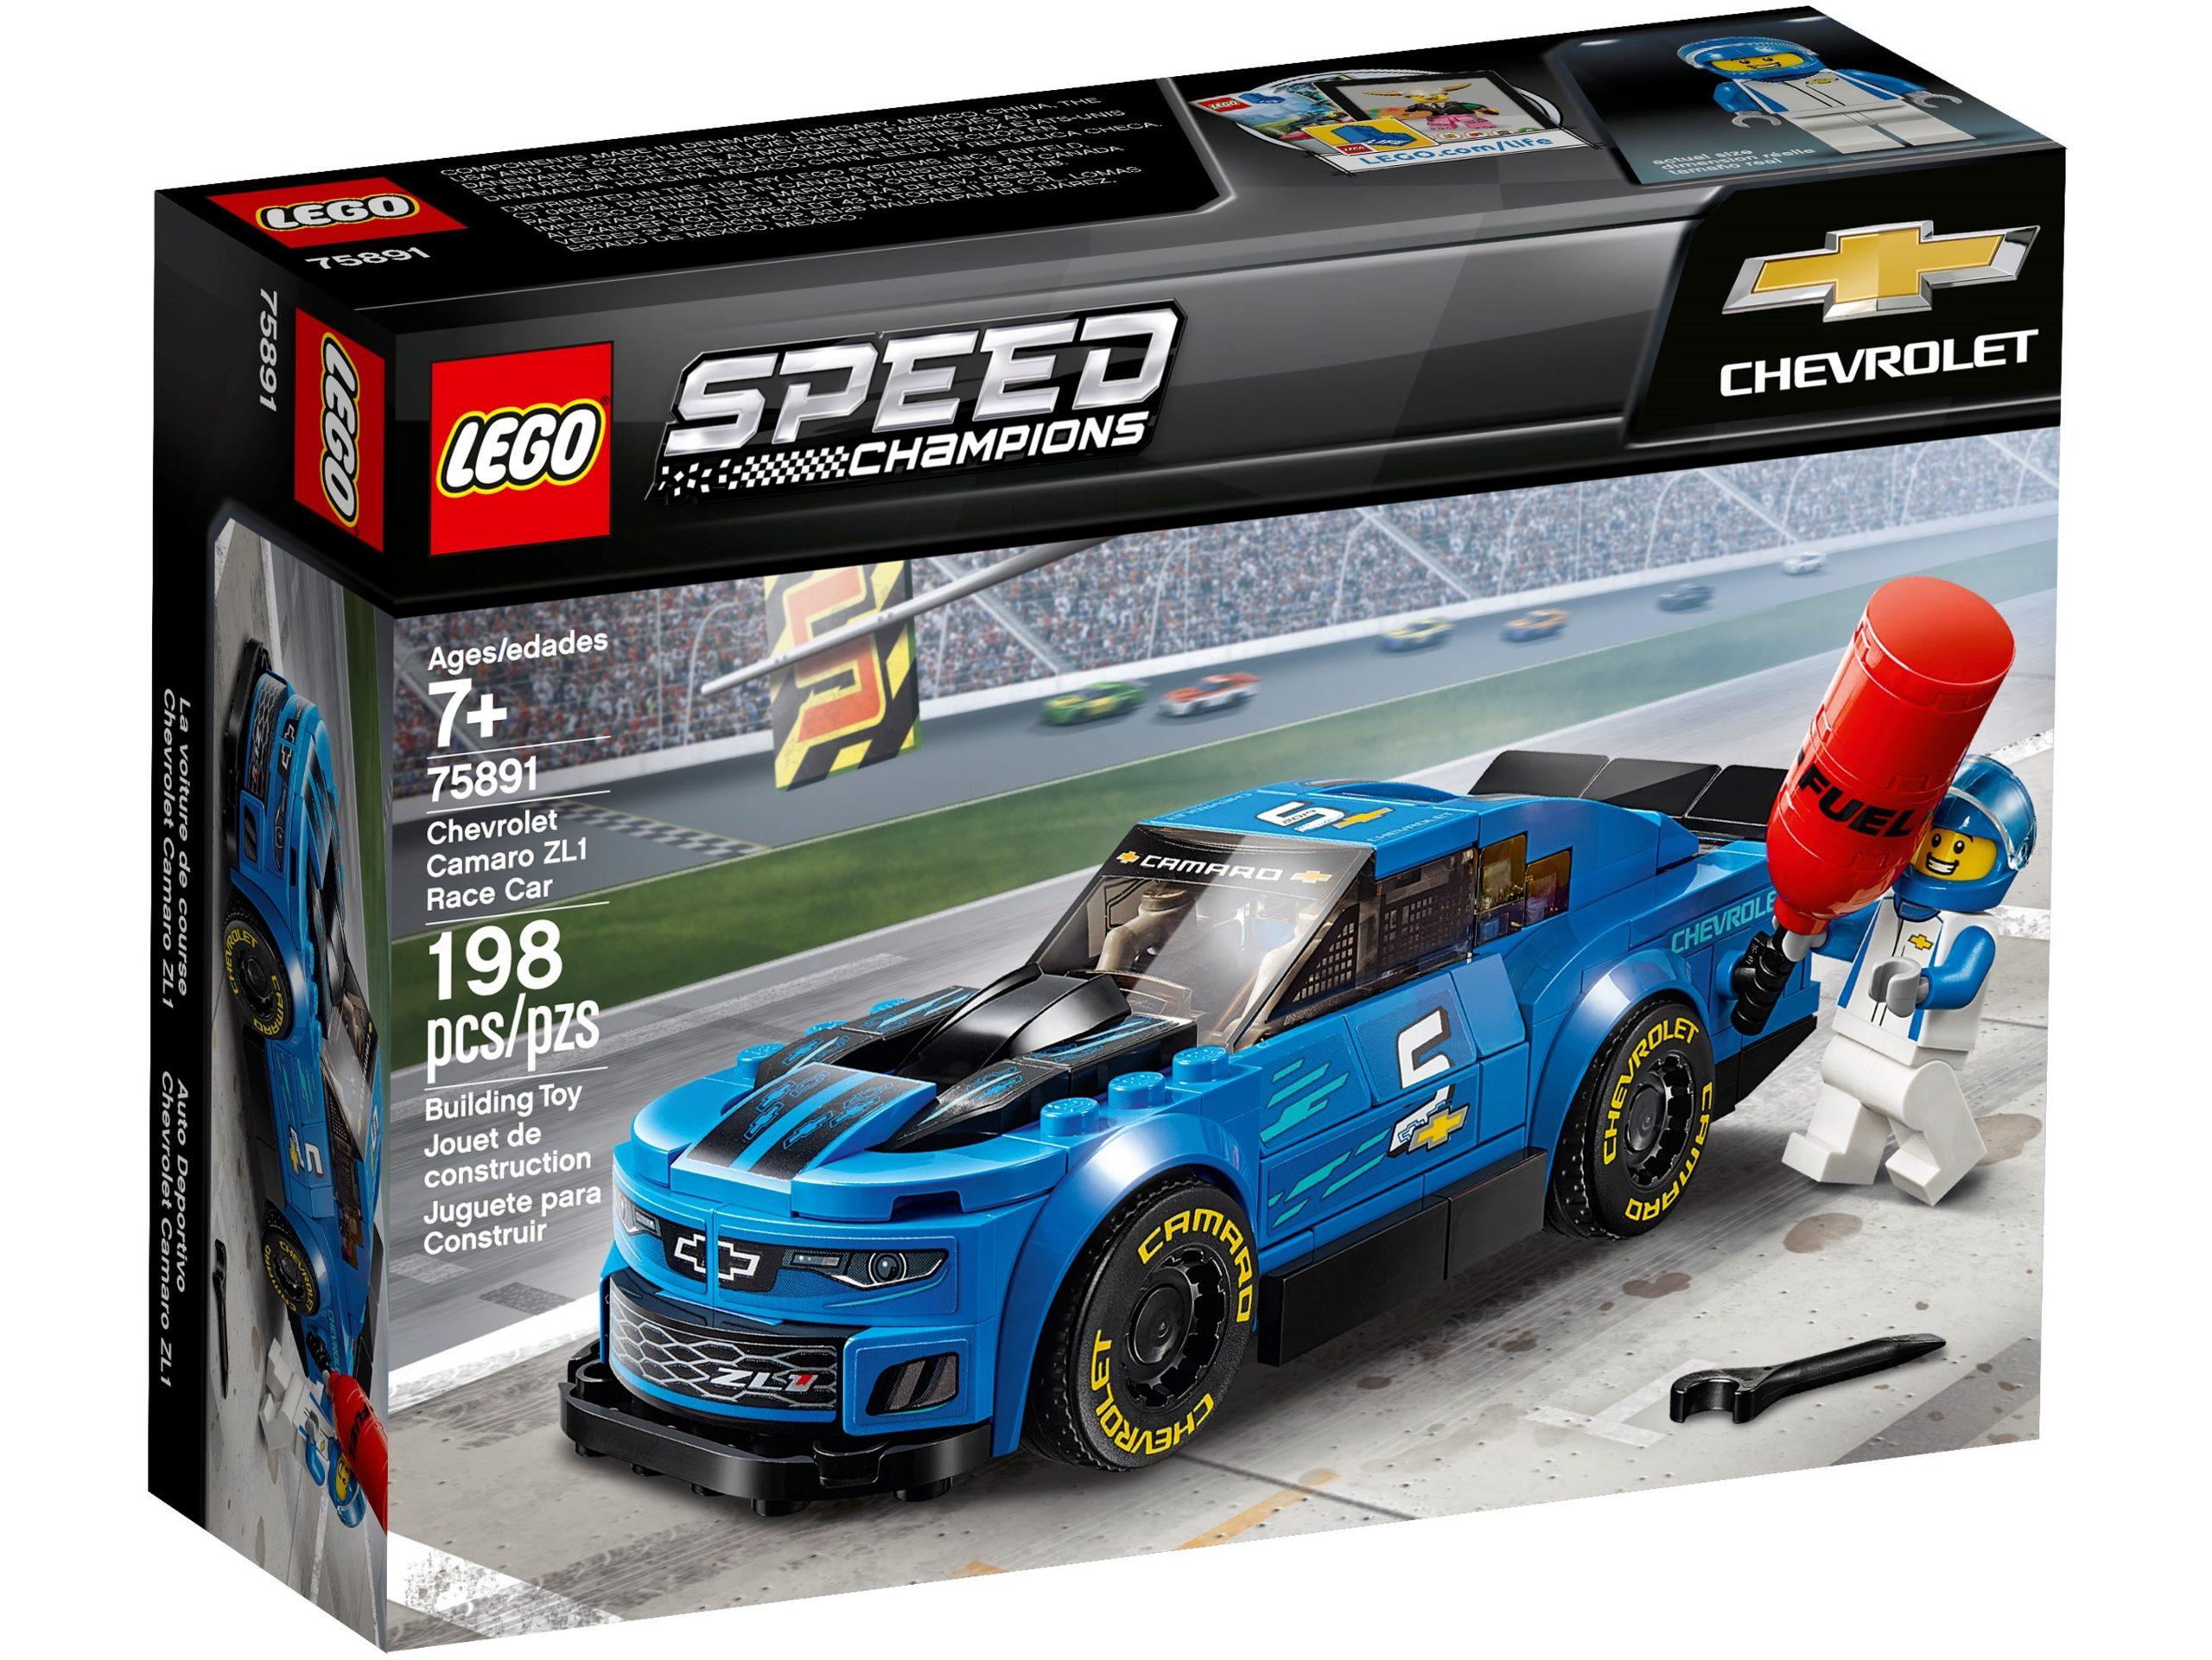 lego 75891 chevrolet camaro zl1 race car scaled